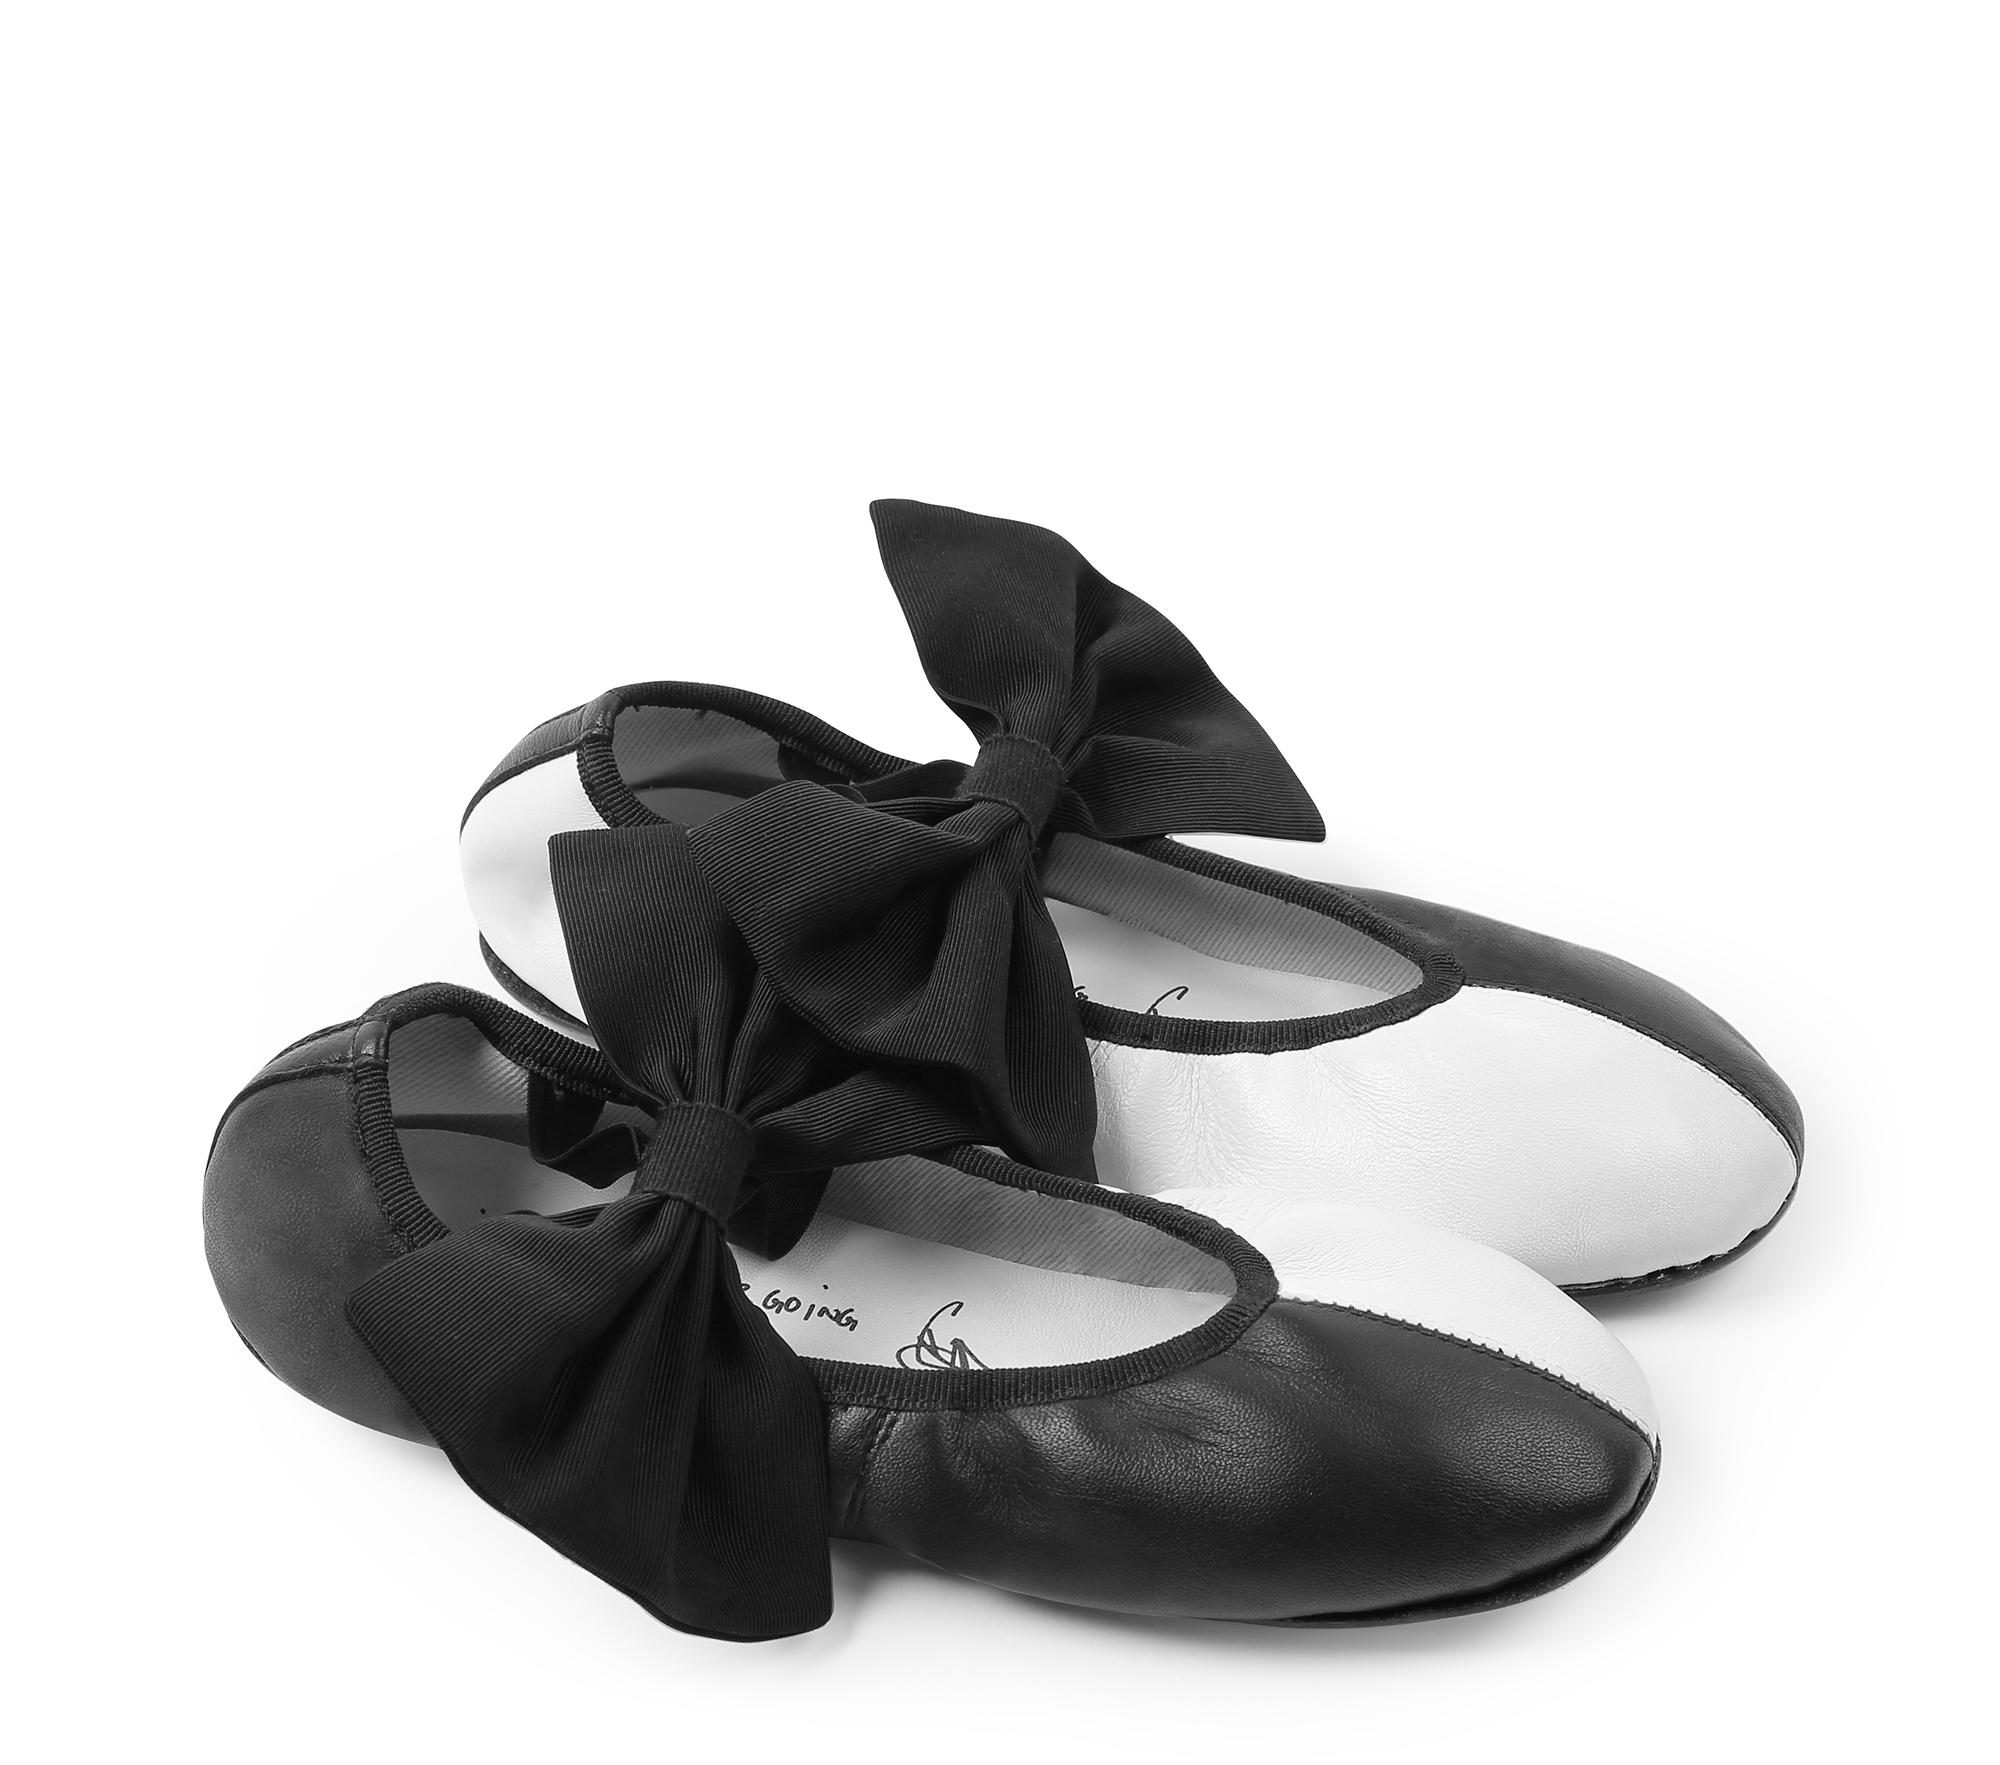 Sophia ballerinas by SIA